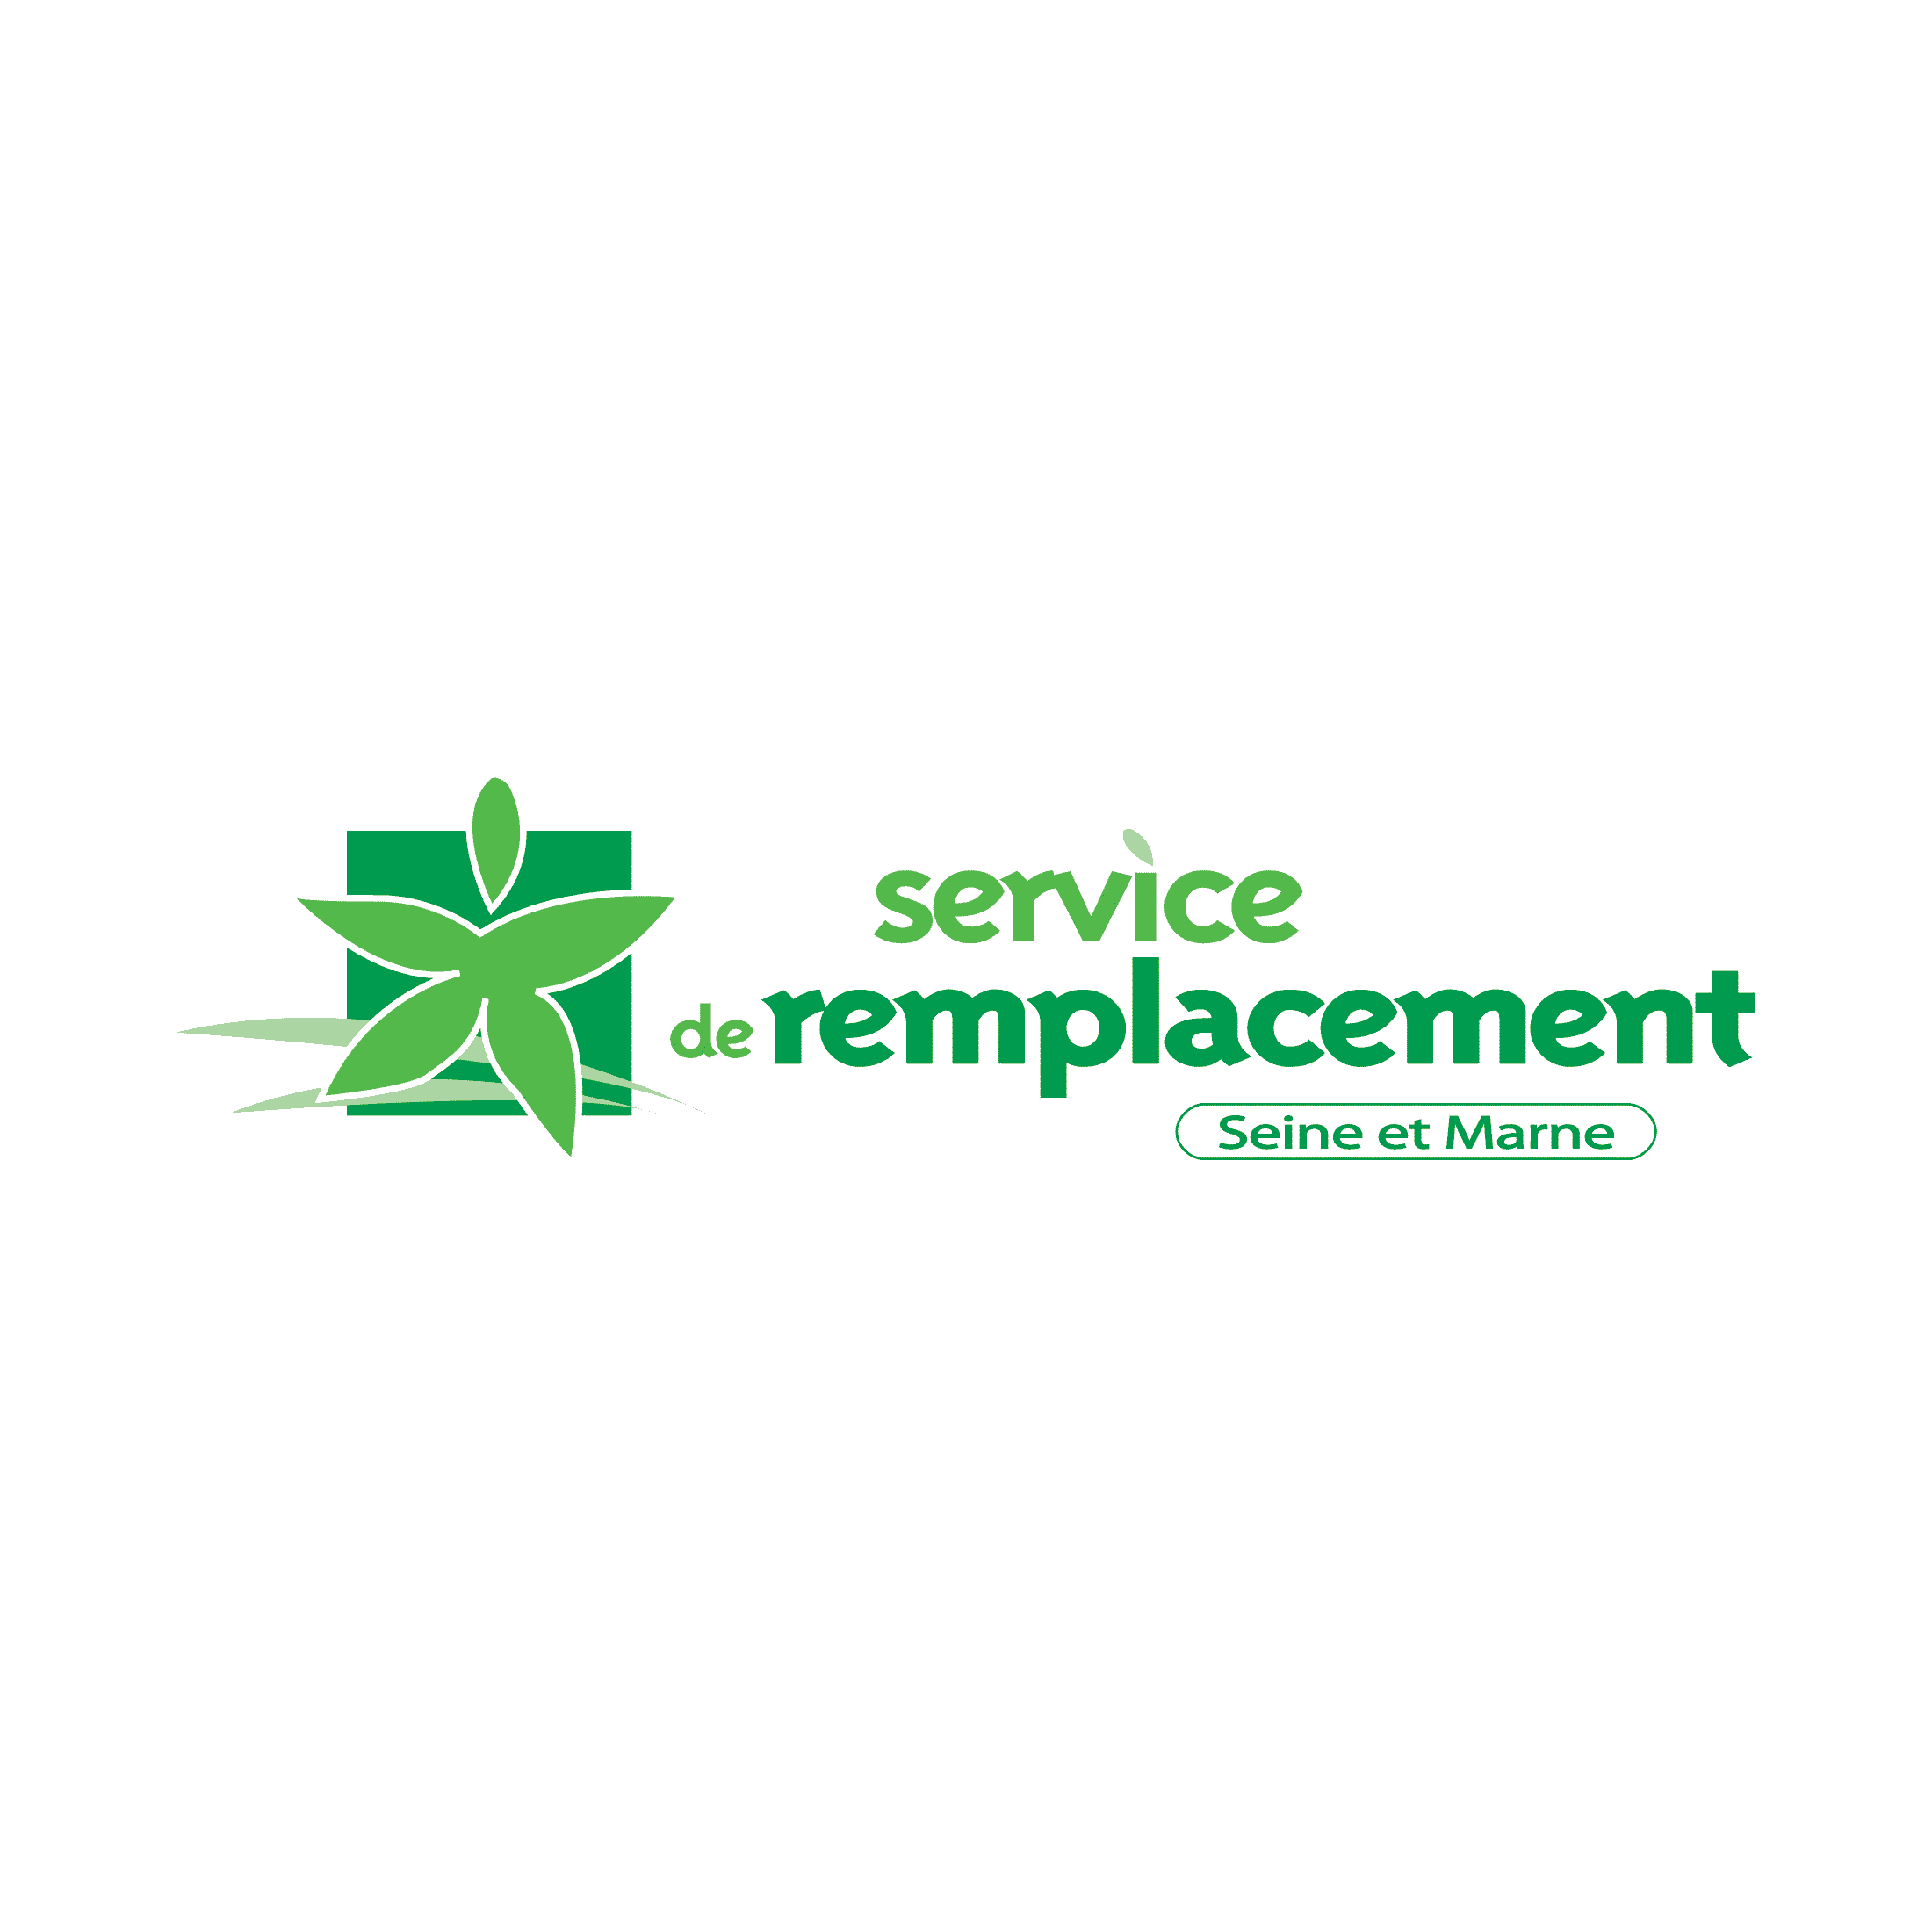 SERVICE REMPLACEMENT SEINE ET MARNE